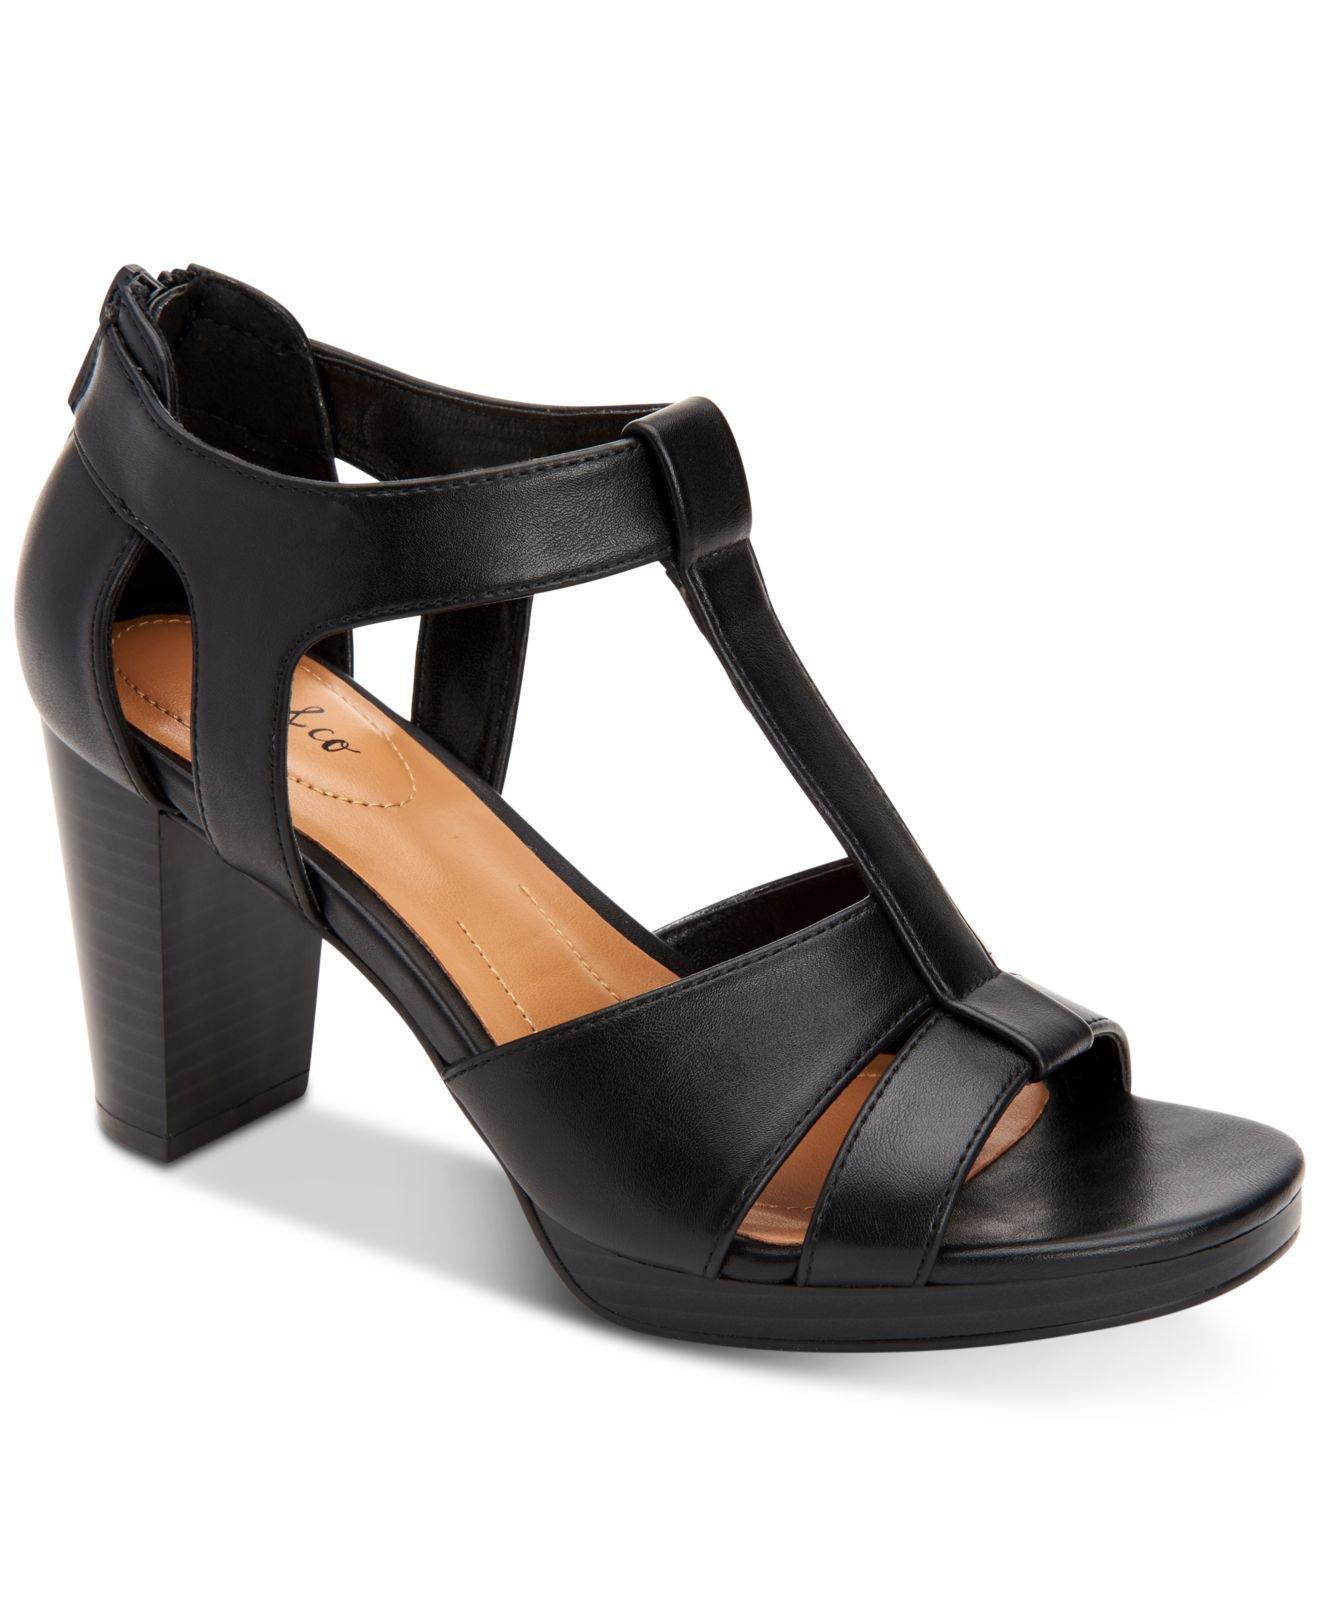 659a049f0d9 Lyst - Style   Co. Ophelia Block-heel Cutout Sandals